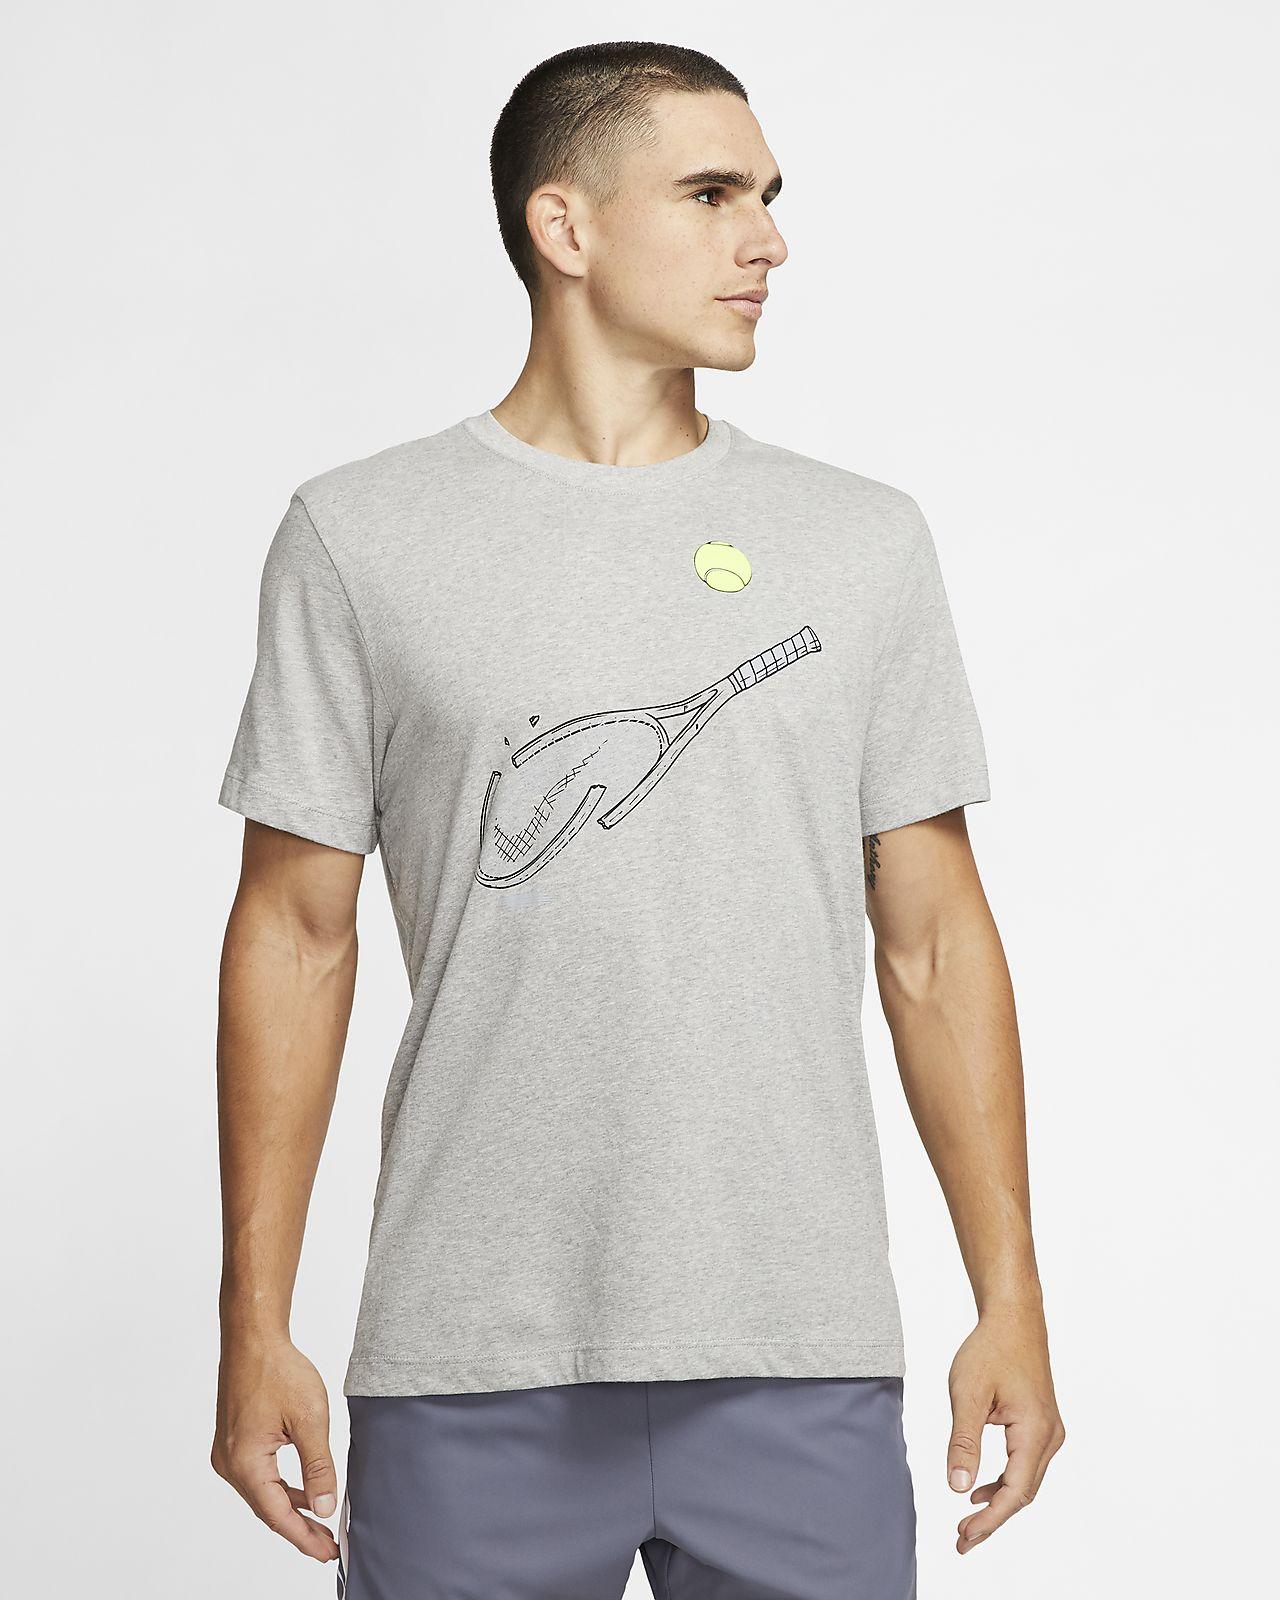 NikeCourt Dri FIT Men's Graphic Tennis T Shirt